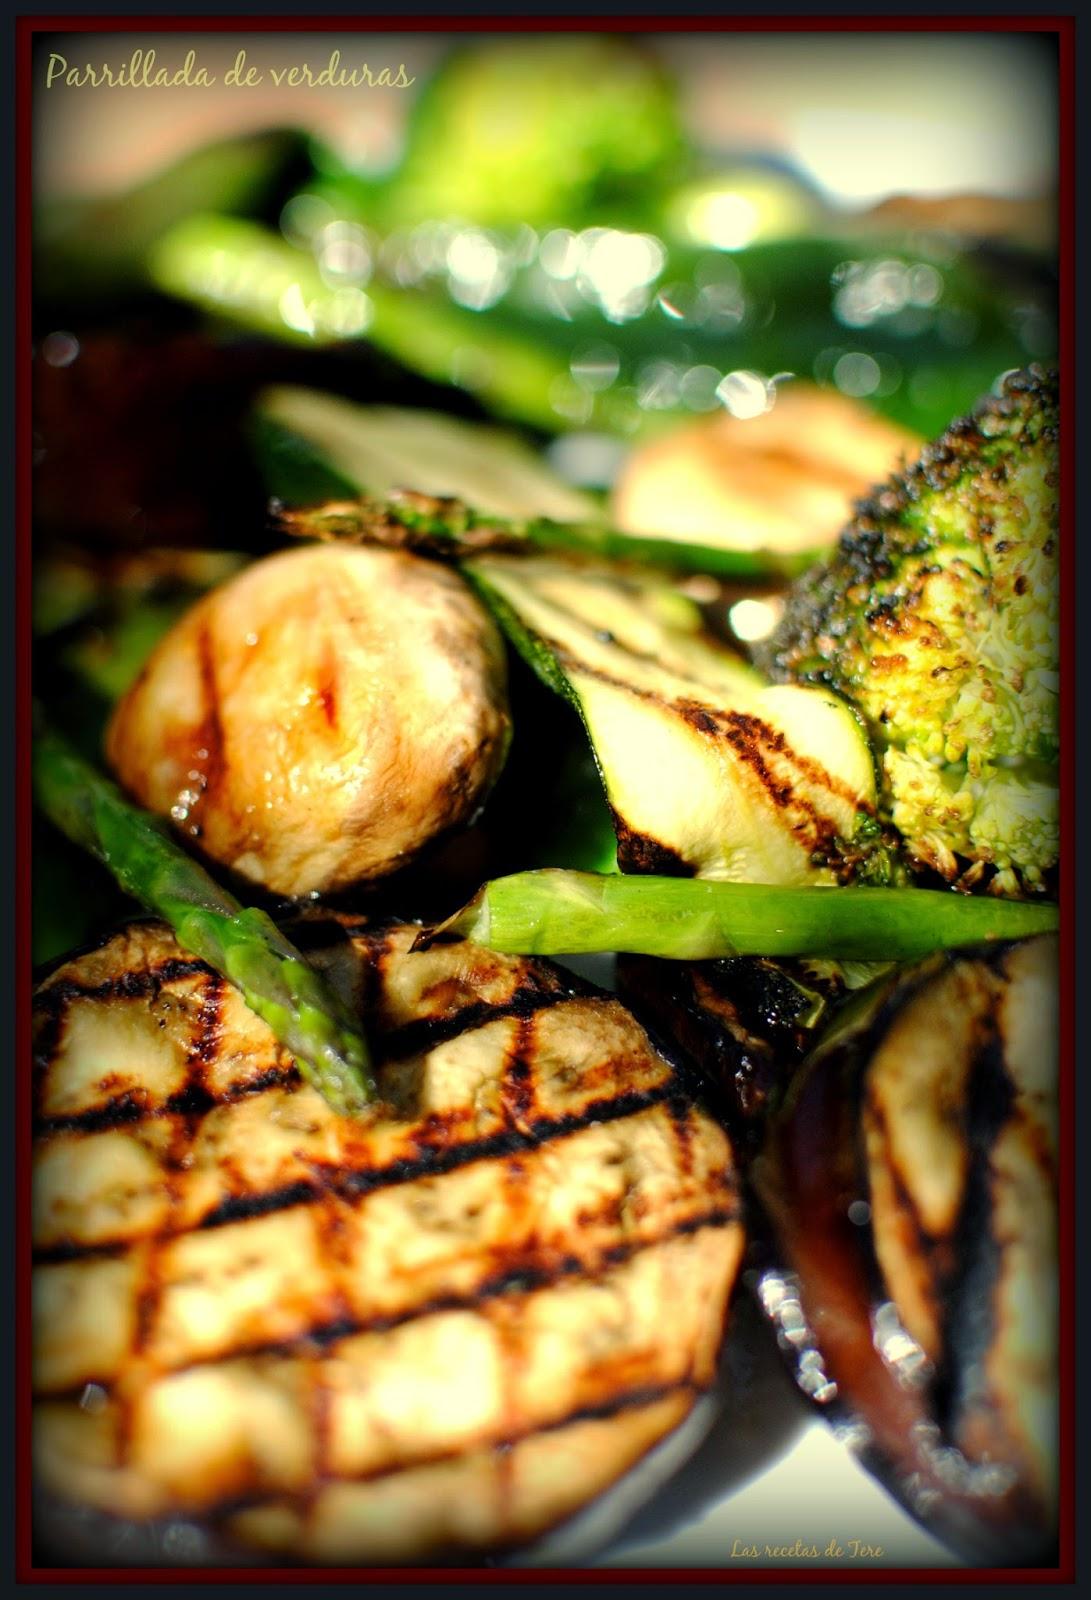 parrillada de verduras tererecetas 02